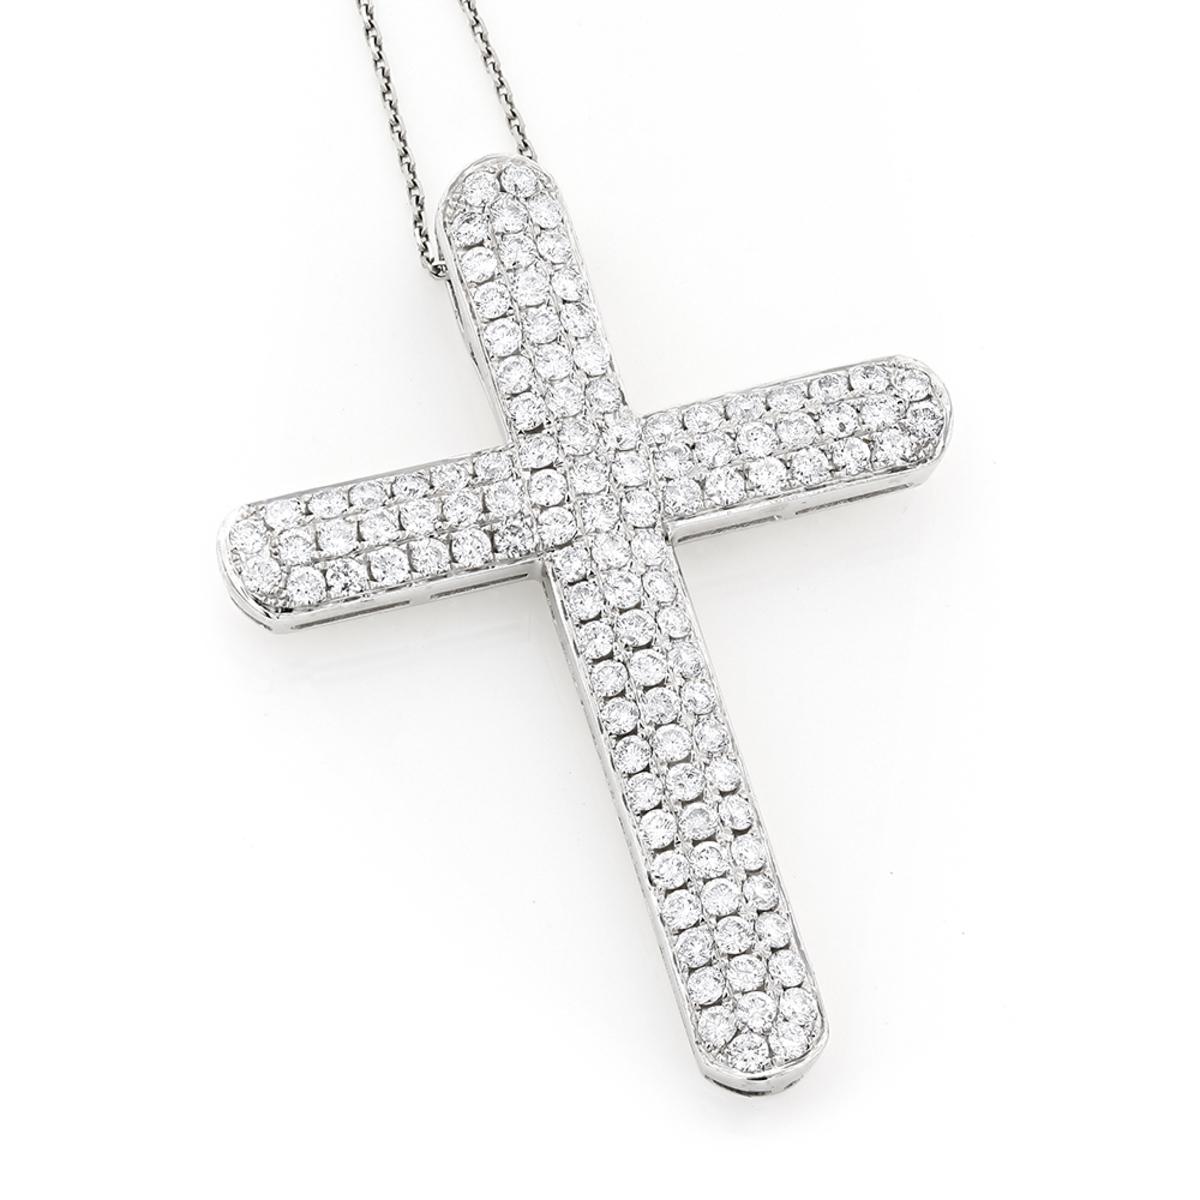 Pave Diamond Cross Pendant 4.06ct 14K